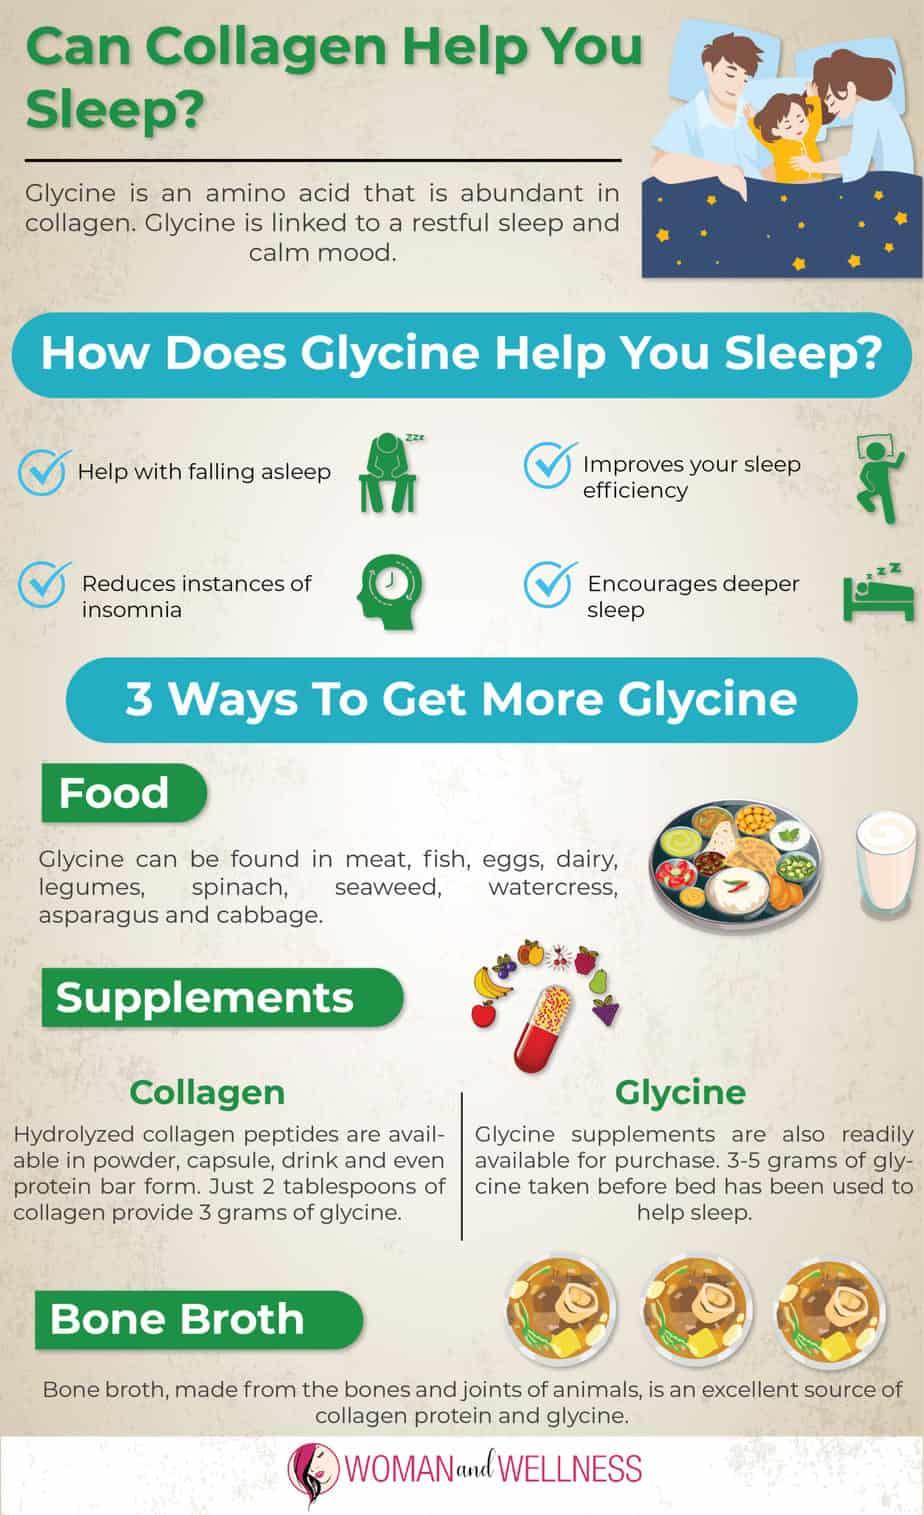 Can collagen help you sleep